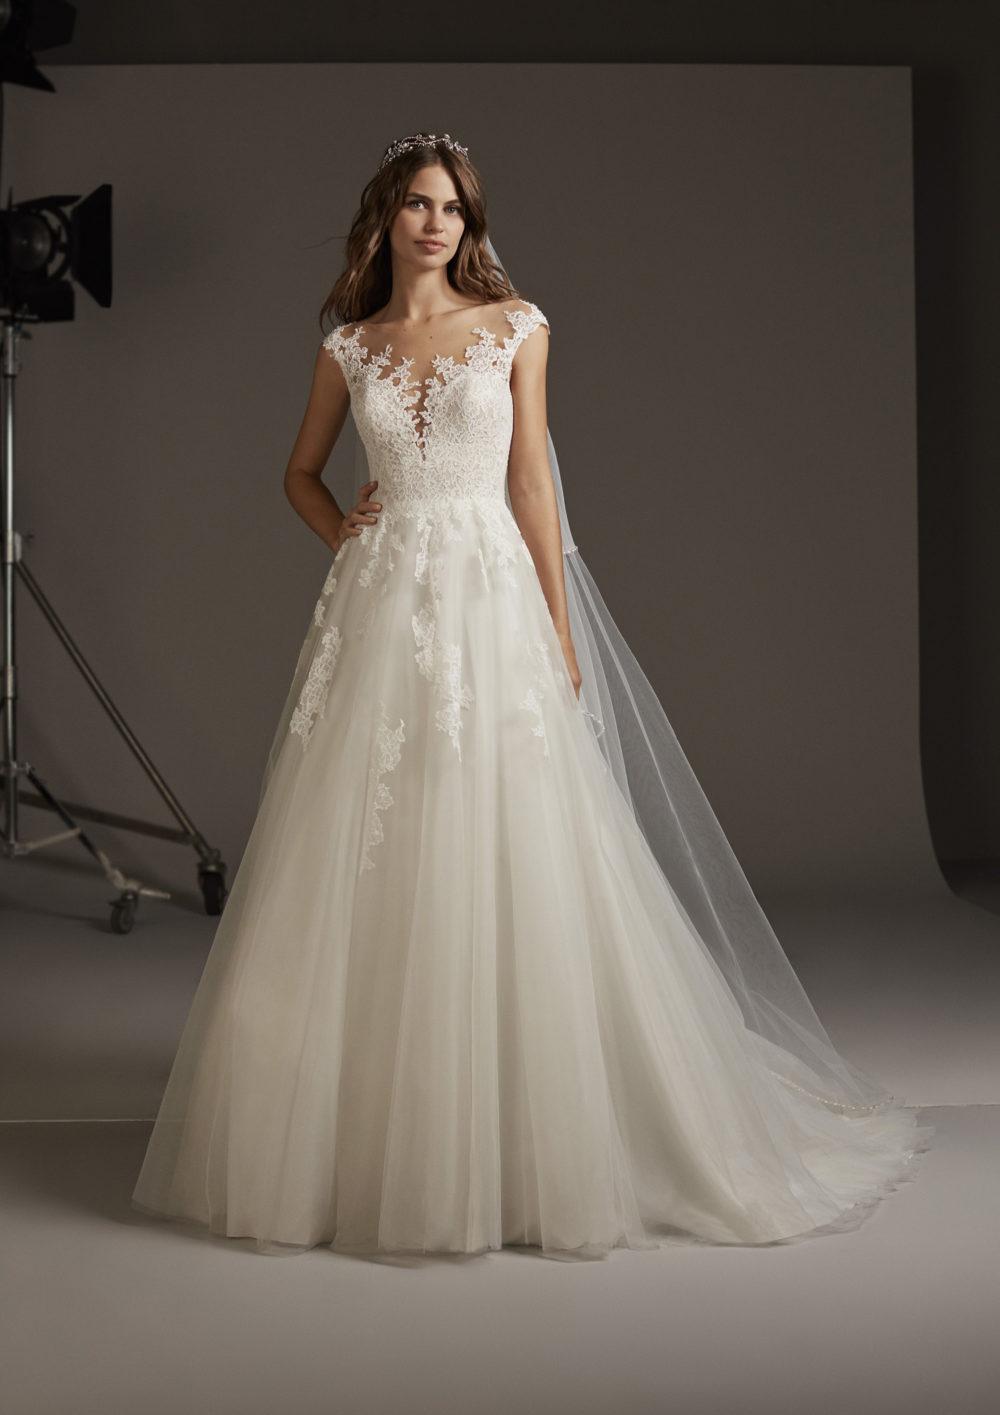 Mariages: abito da sposa Pronovias 2020 a Vicenza, Verona, Padova, Veneto VULCANIA